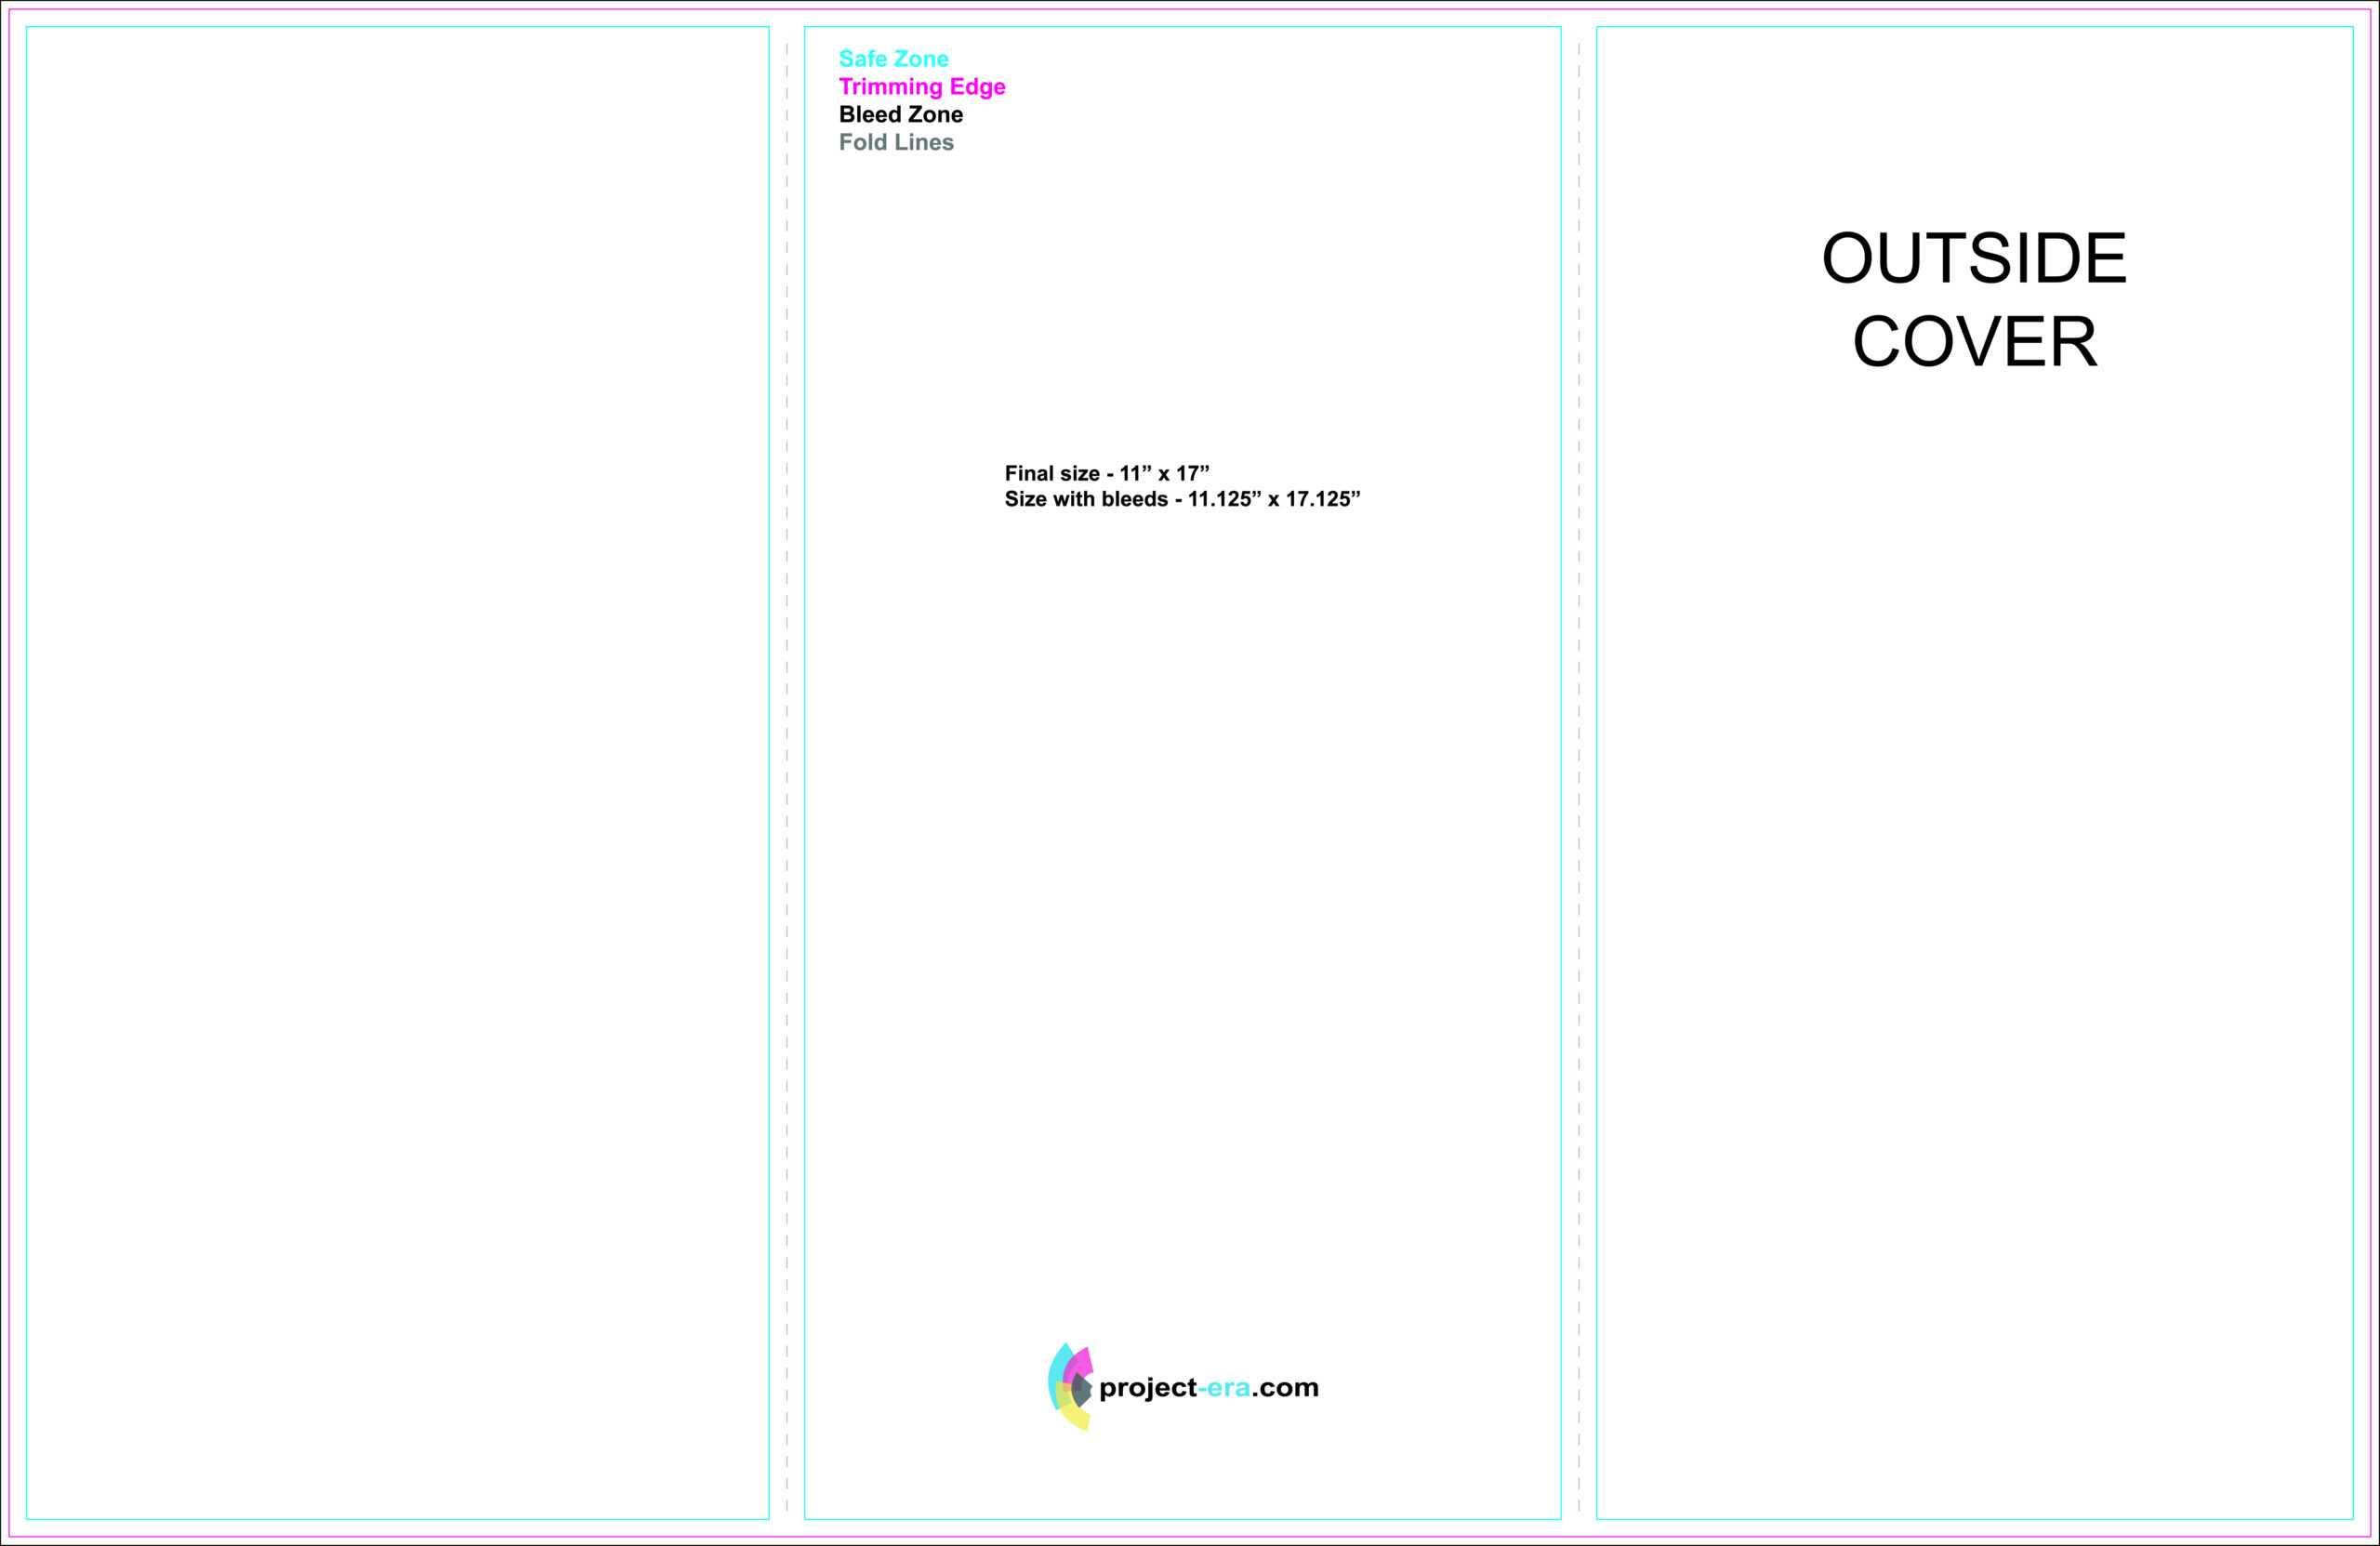 Project Era - Print & Design Services - Print Templates Inside Brochure 3 Fold Template Psd